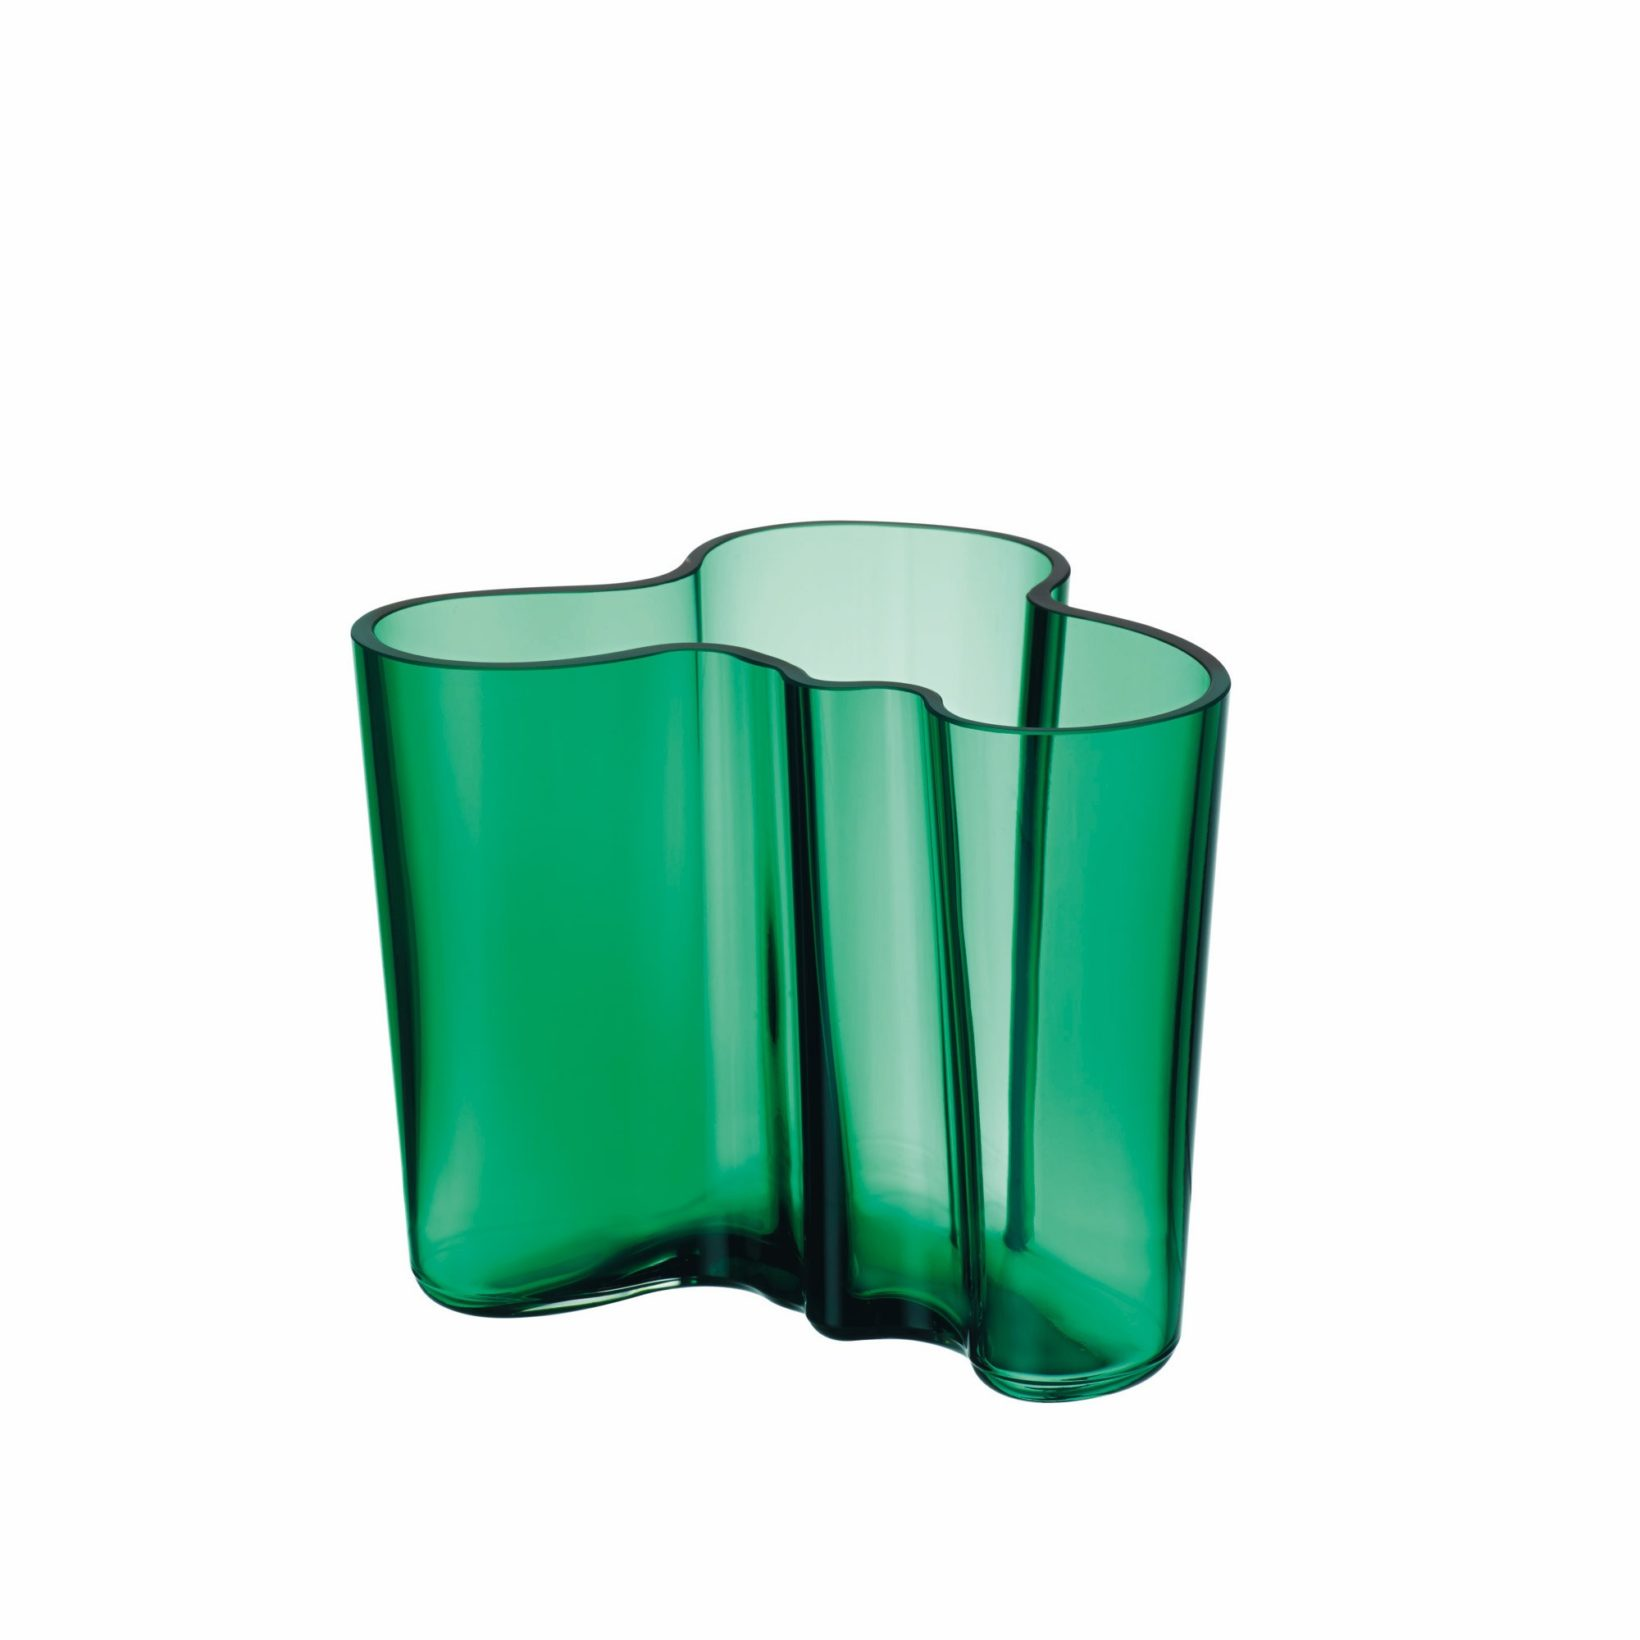 Buy Iittala S Aalto 120mm Glass Vase By Alvar Aalto